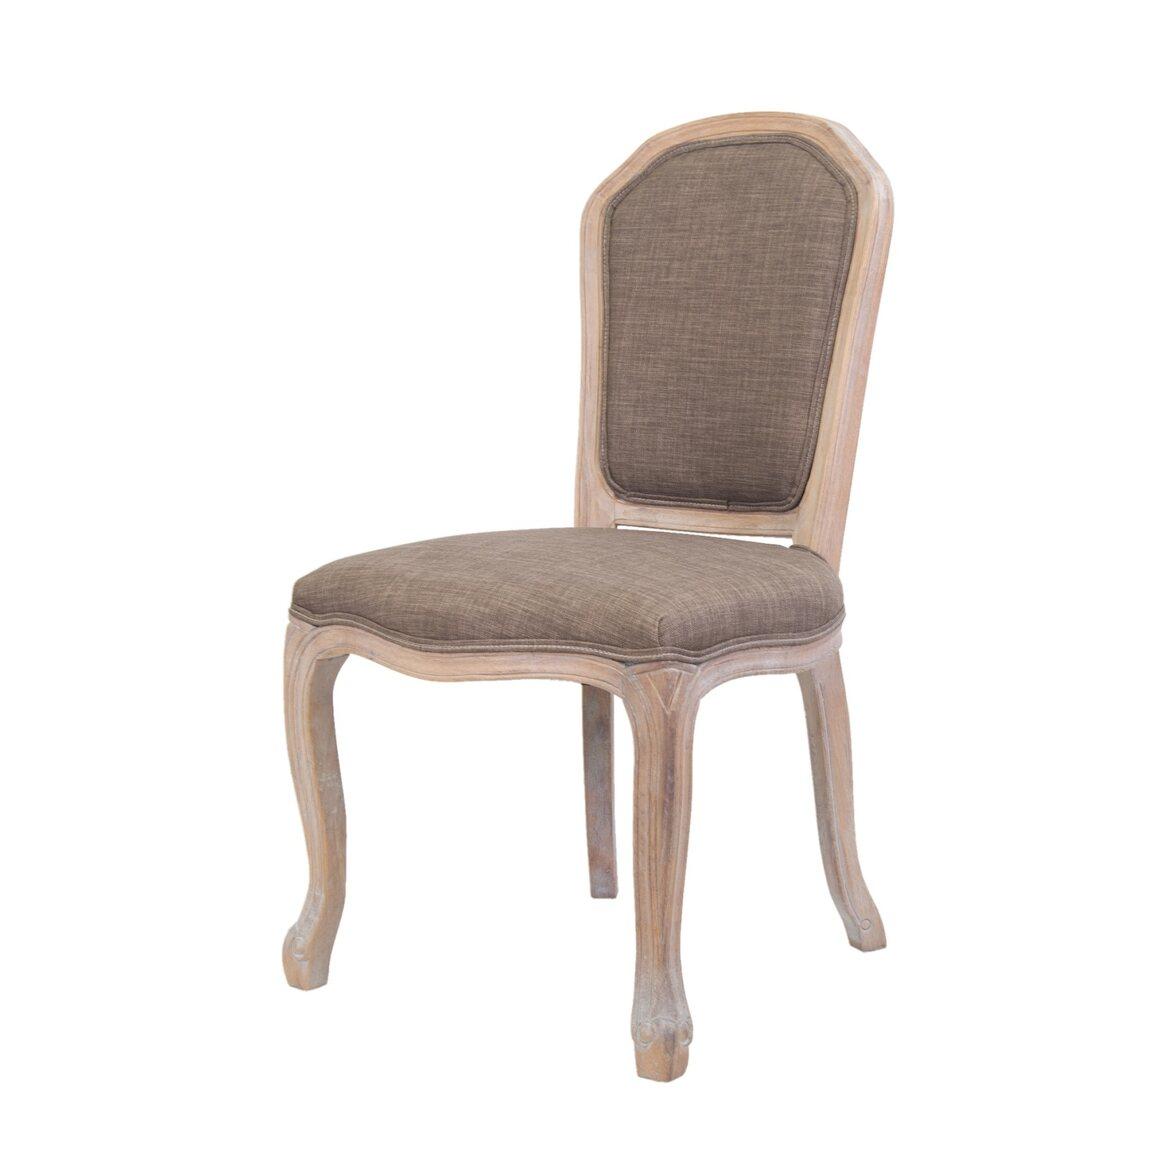 Стул Granes brown 4   Обеденные стулья Kingsby